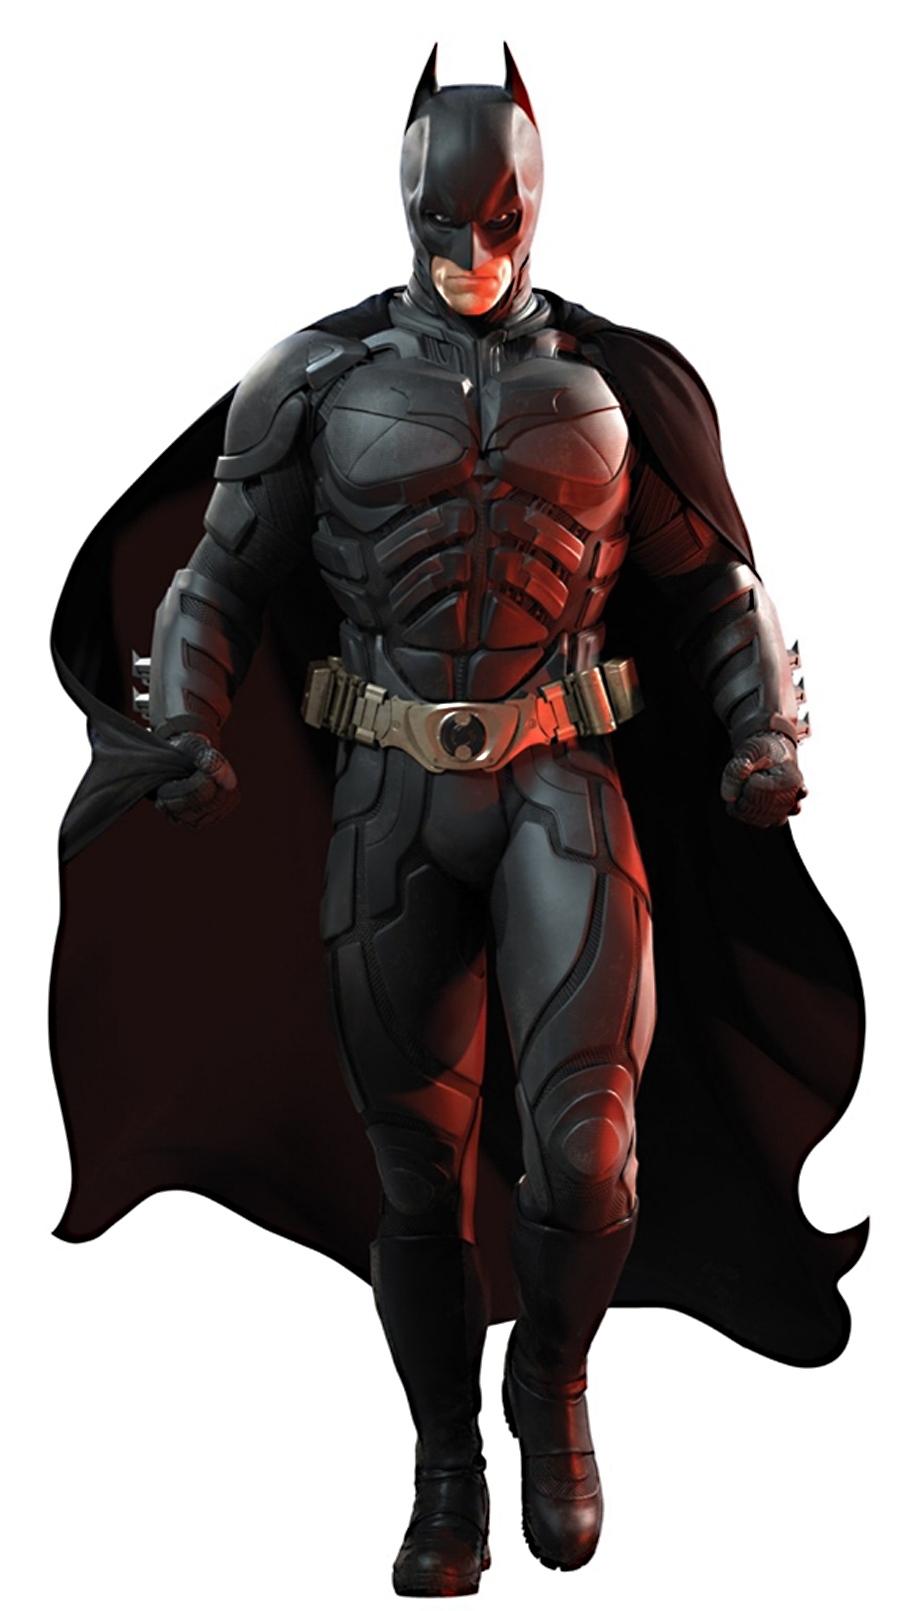 christian-bale-batman-dark-knight-rises